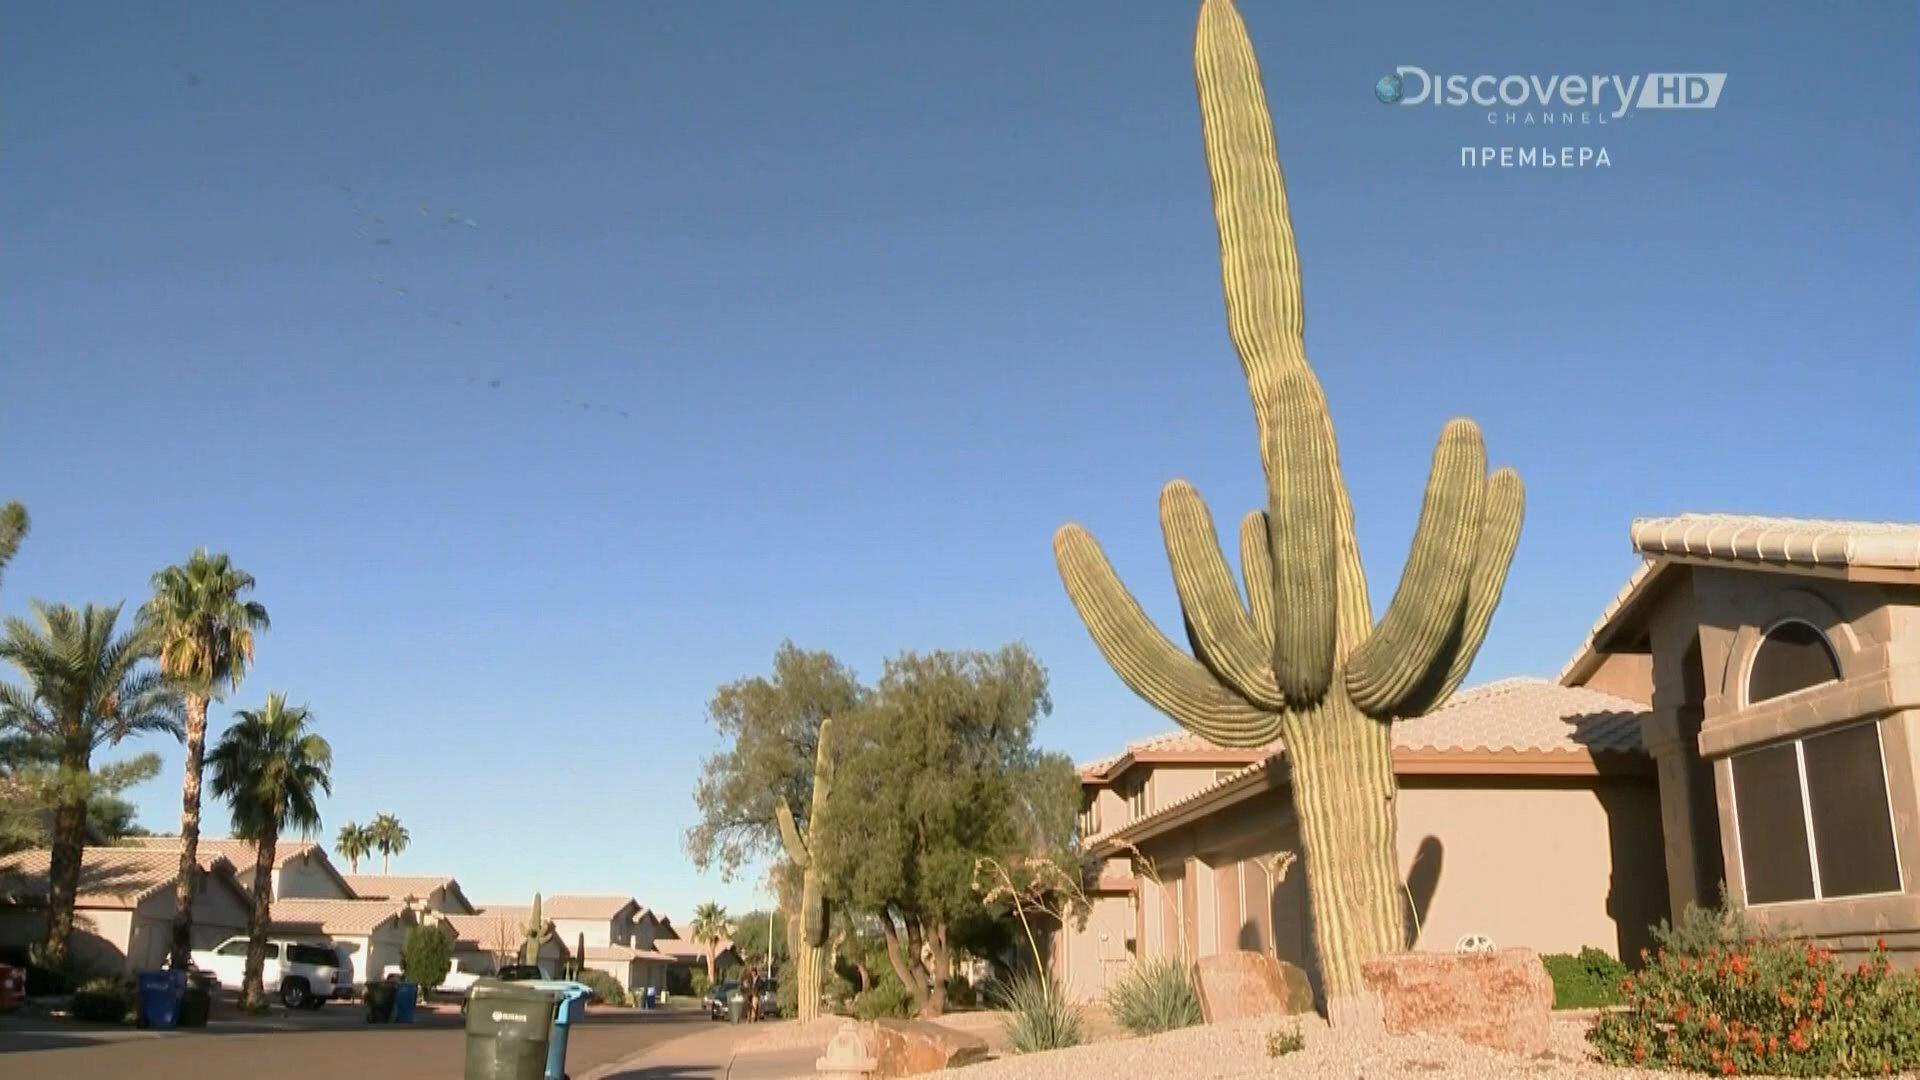 Discovery. Битва за недвижимость / Property Wars (2 сезон: 1-24 серии из 24) (2013) HDTV 1080i